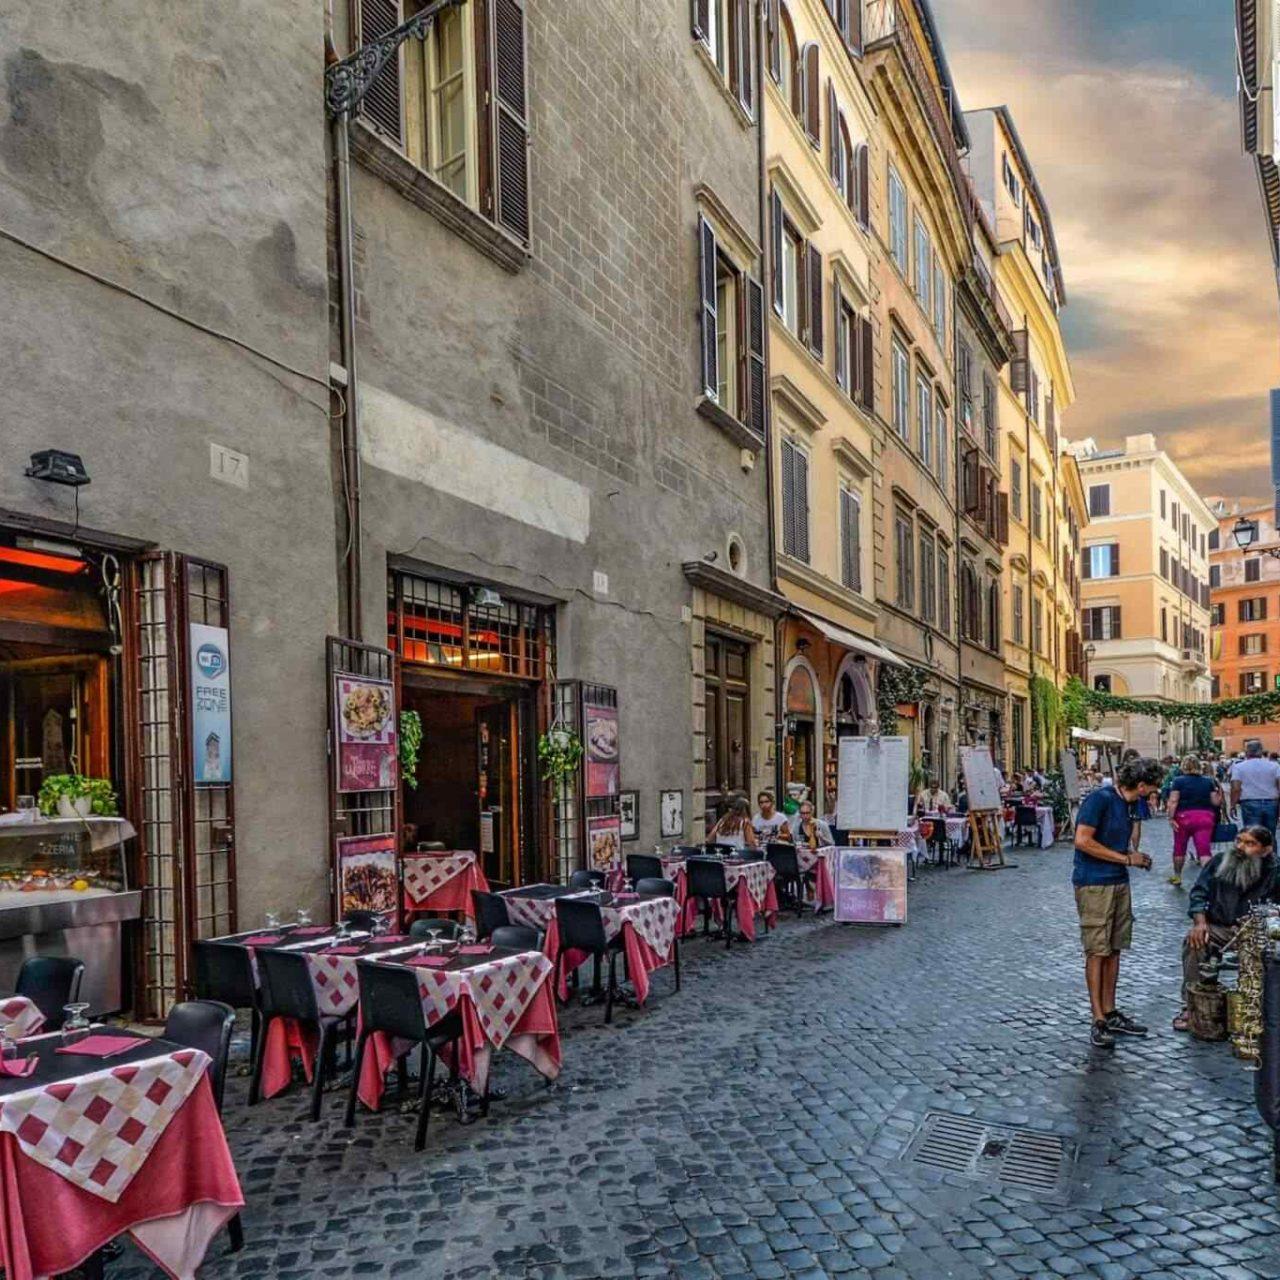 https://menudownloads.com/wp-content/uploads/2017/10/restaurant-italian-6-1280x1280.jpg